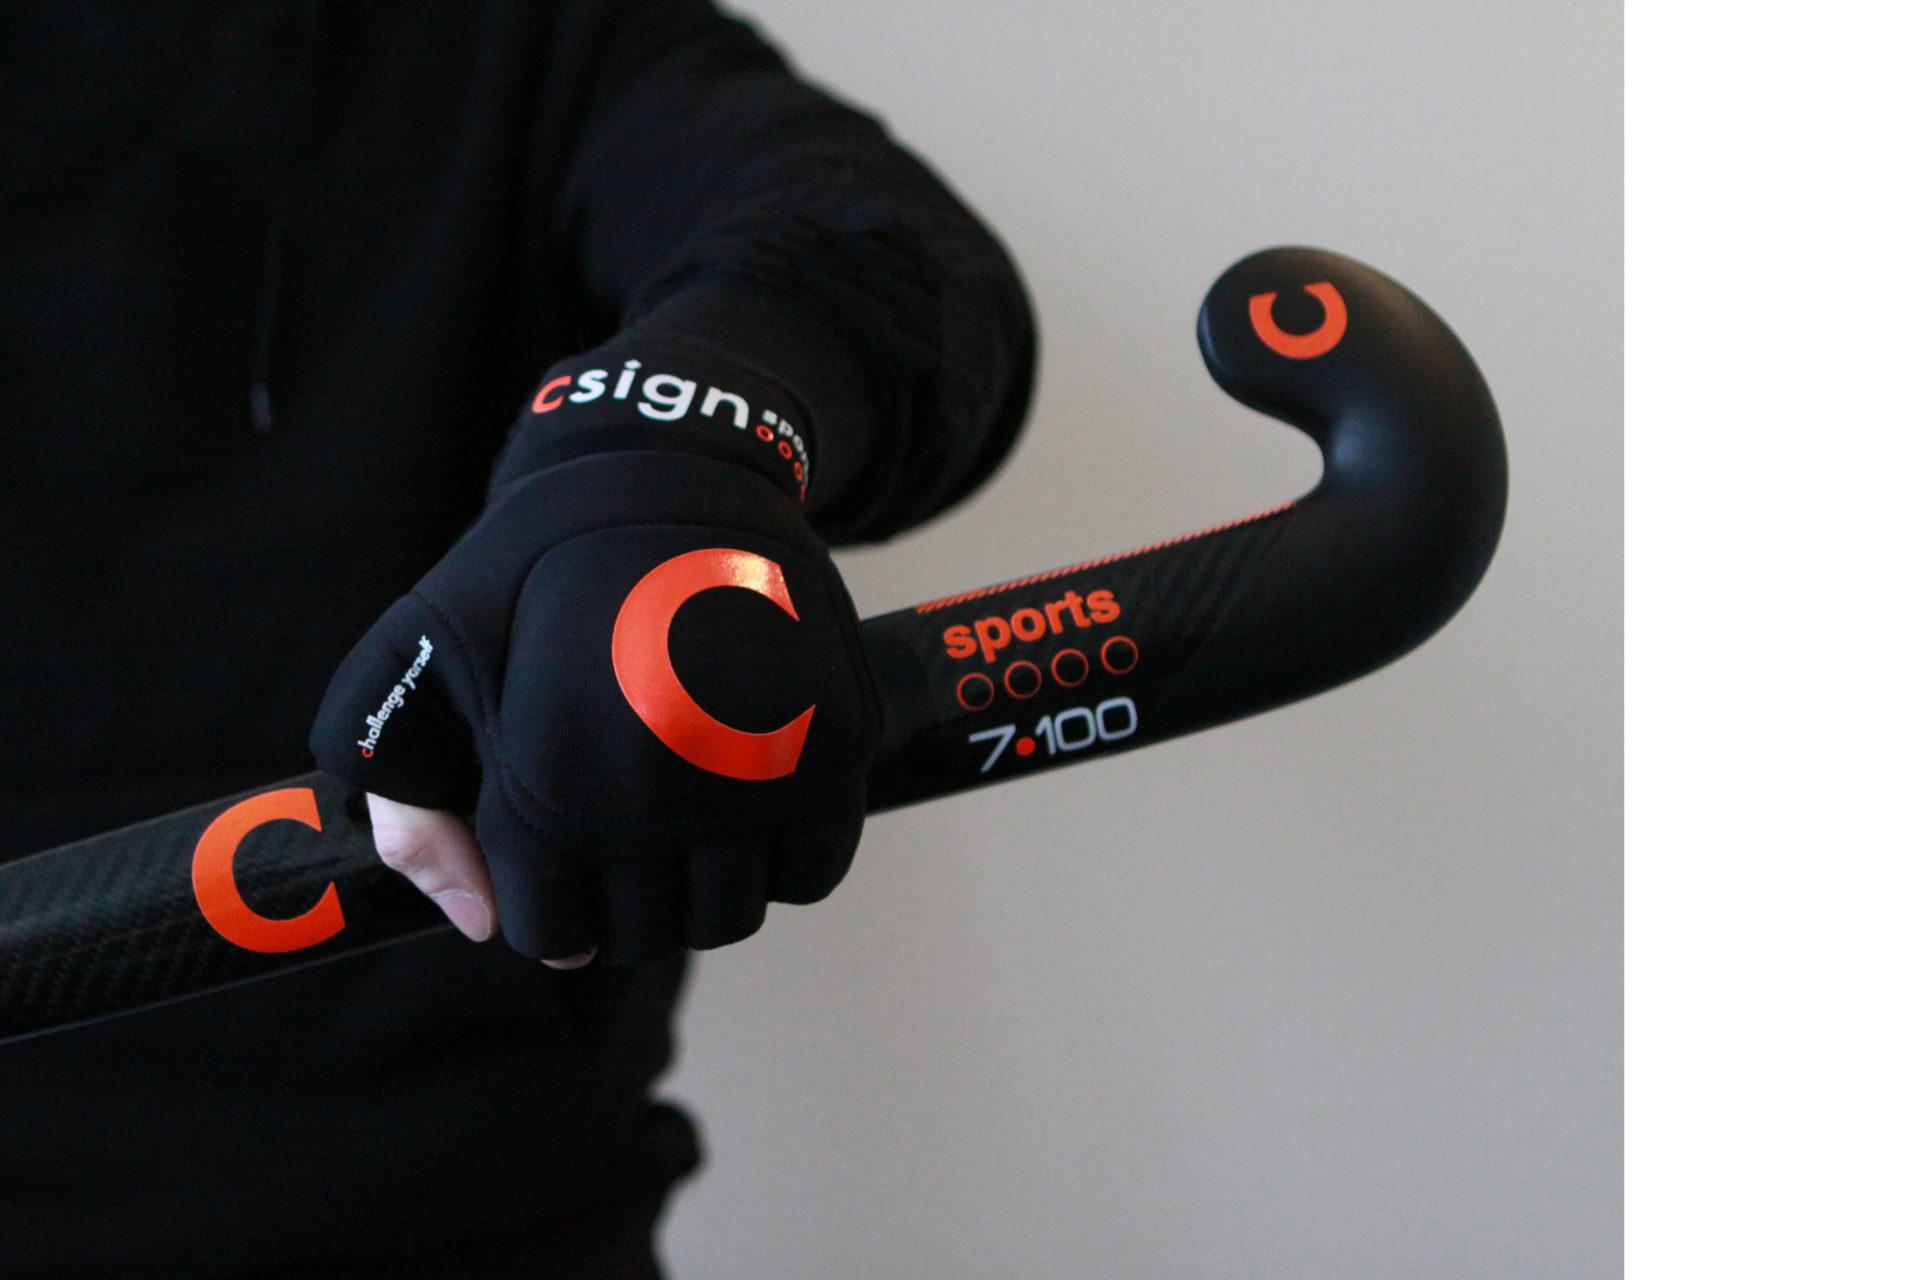 Hockeygear - Csignsports